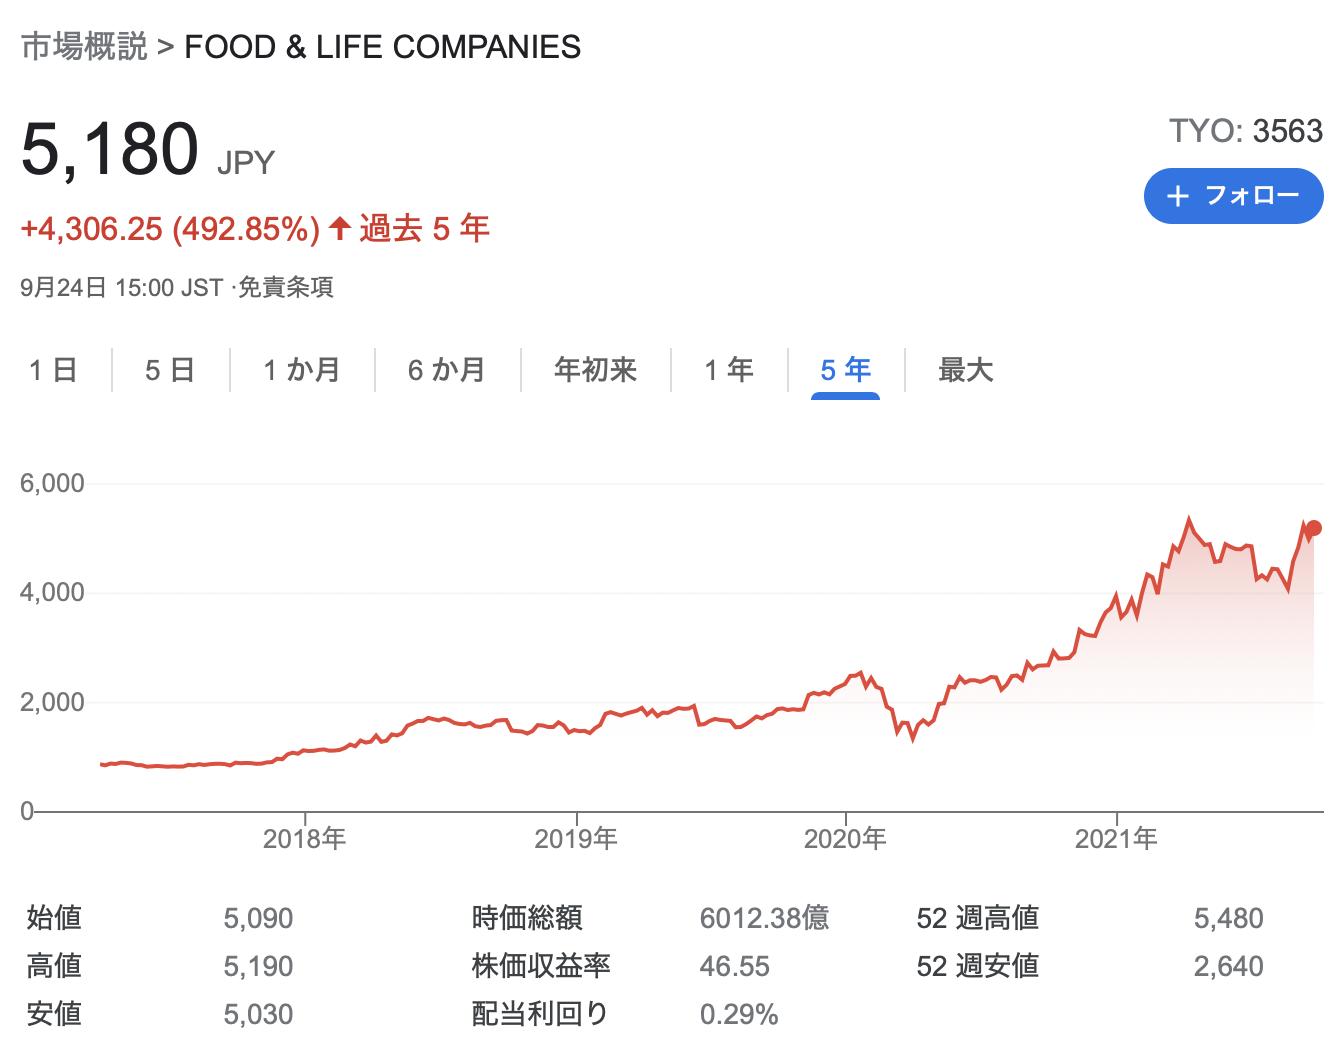 FOOD & LIFE COMPANIES(スシロー)2021年9月期3Q決算を徹底解説! さとり世代の株日記 資産運用 株 投資 資産形成 株式投資